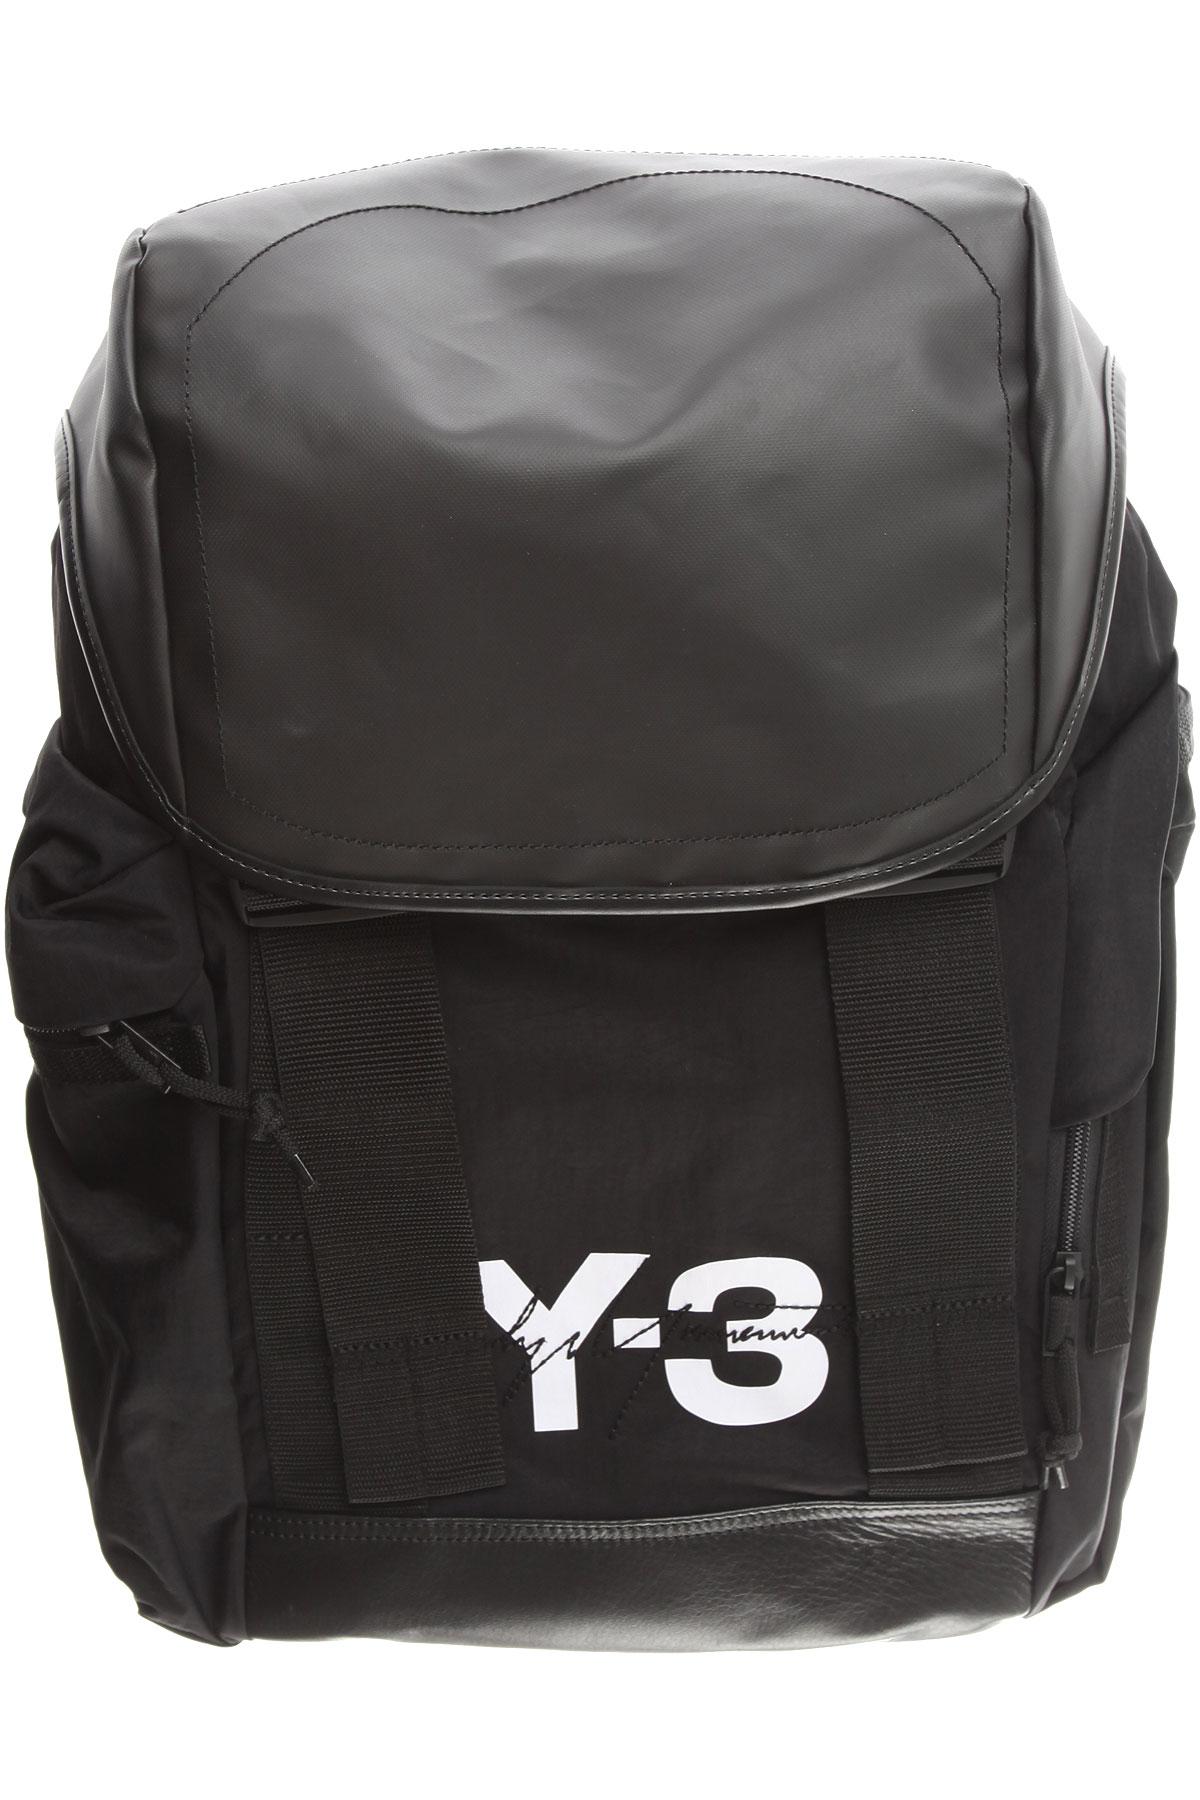 Image of Y3 by Yohji Yamamoto Backpack for Men, Black, Nylon, 2017